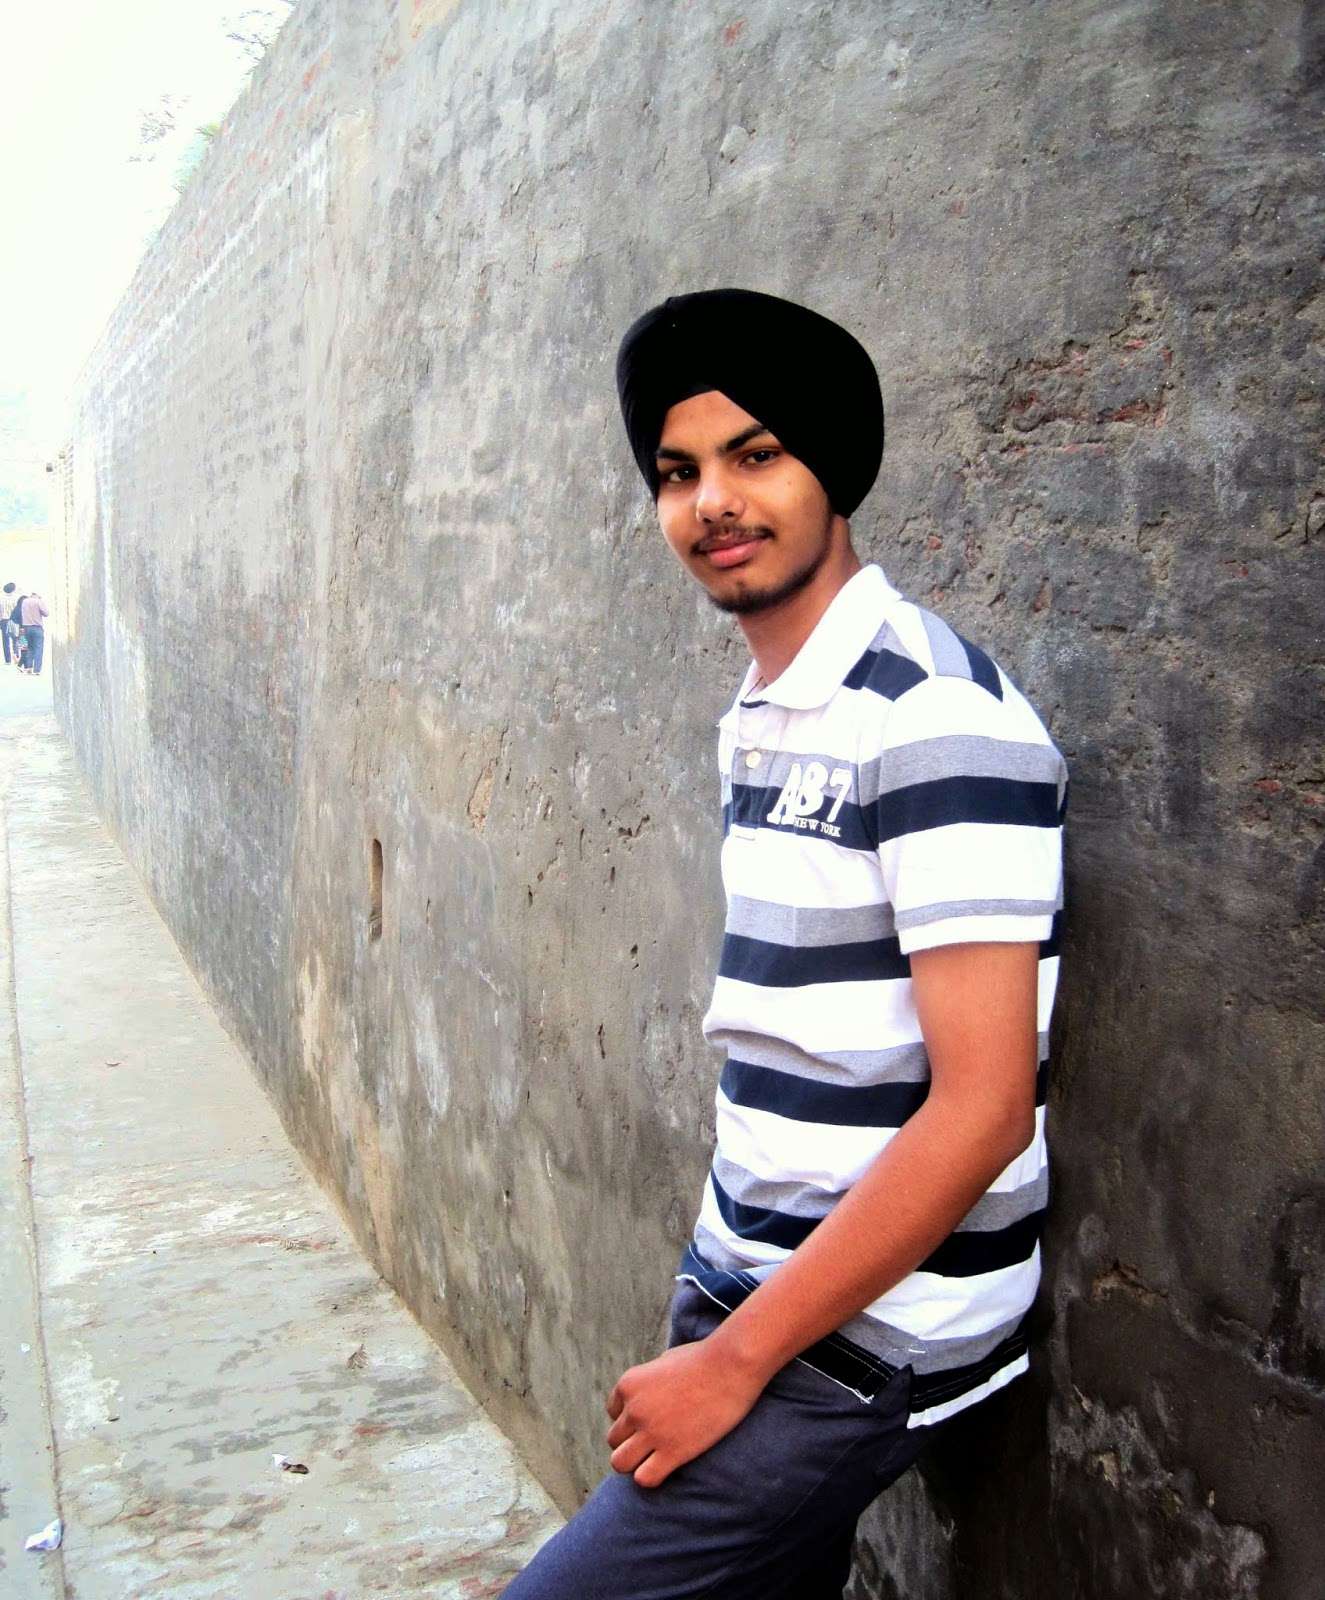 See Photos of Pawan Lubana including Pawan's still, wallpaper,  Desi Munde Pictures, Desi Munde Images, Desi Munde Graphics,  Desi Munde scraps Download 313 Sikh turban images and stock photos Portrait of Sikh boy (4-5) in turban, smiling Wonderful Sardar In Turban... Turban Boy Looking Great...Dashing Sardar Patiala Shahi Turbanator turban-boy dastar in Dastar Wallpaper | Turban Wallpaper Photos | Sikh Photos and wallpapers | Gurudwara Wallpaper | Gurbani Wording and Quotes wallpaper Posts about patiala shahi turban wallpaper written by http://pawanlubana.blogspot.com/  Posts about TURBAN WALLPAPERS image for turban turban wallpapers punjabi turban images wallpapers  I Love MY Turban ਨਾਲ਼ ਮੇਲ-ਜੋਲ ਬਣਾਉਣ ਲਈ ਫ਼ੇਸਬੁੱਕ ਲਈ ਅੱਜ ਹੀ ...